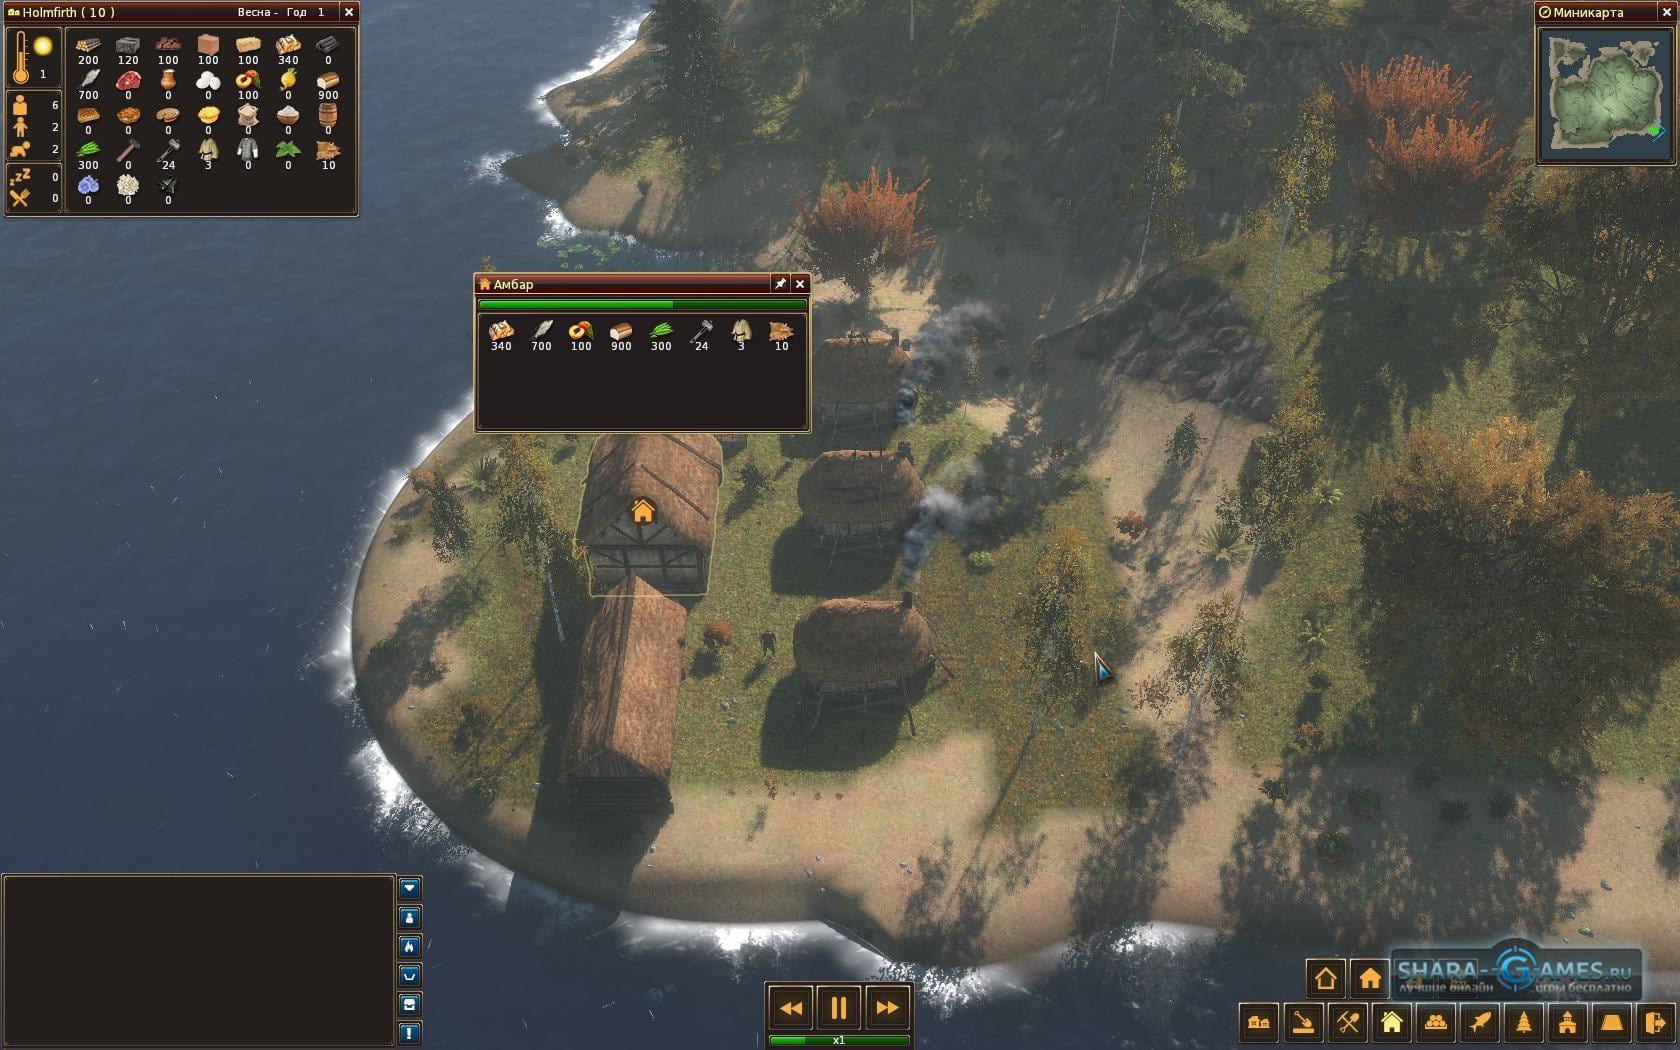 Life is feudal forest village база знаний ролевая 3d он-лайн игра